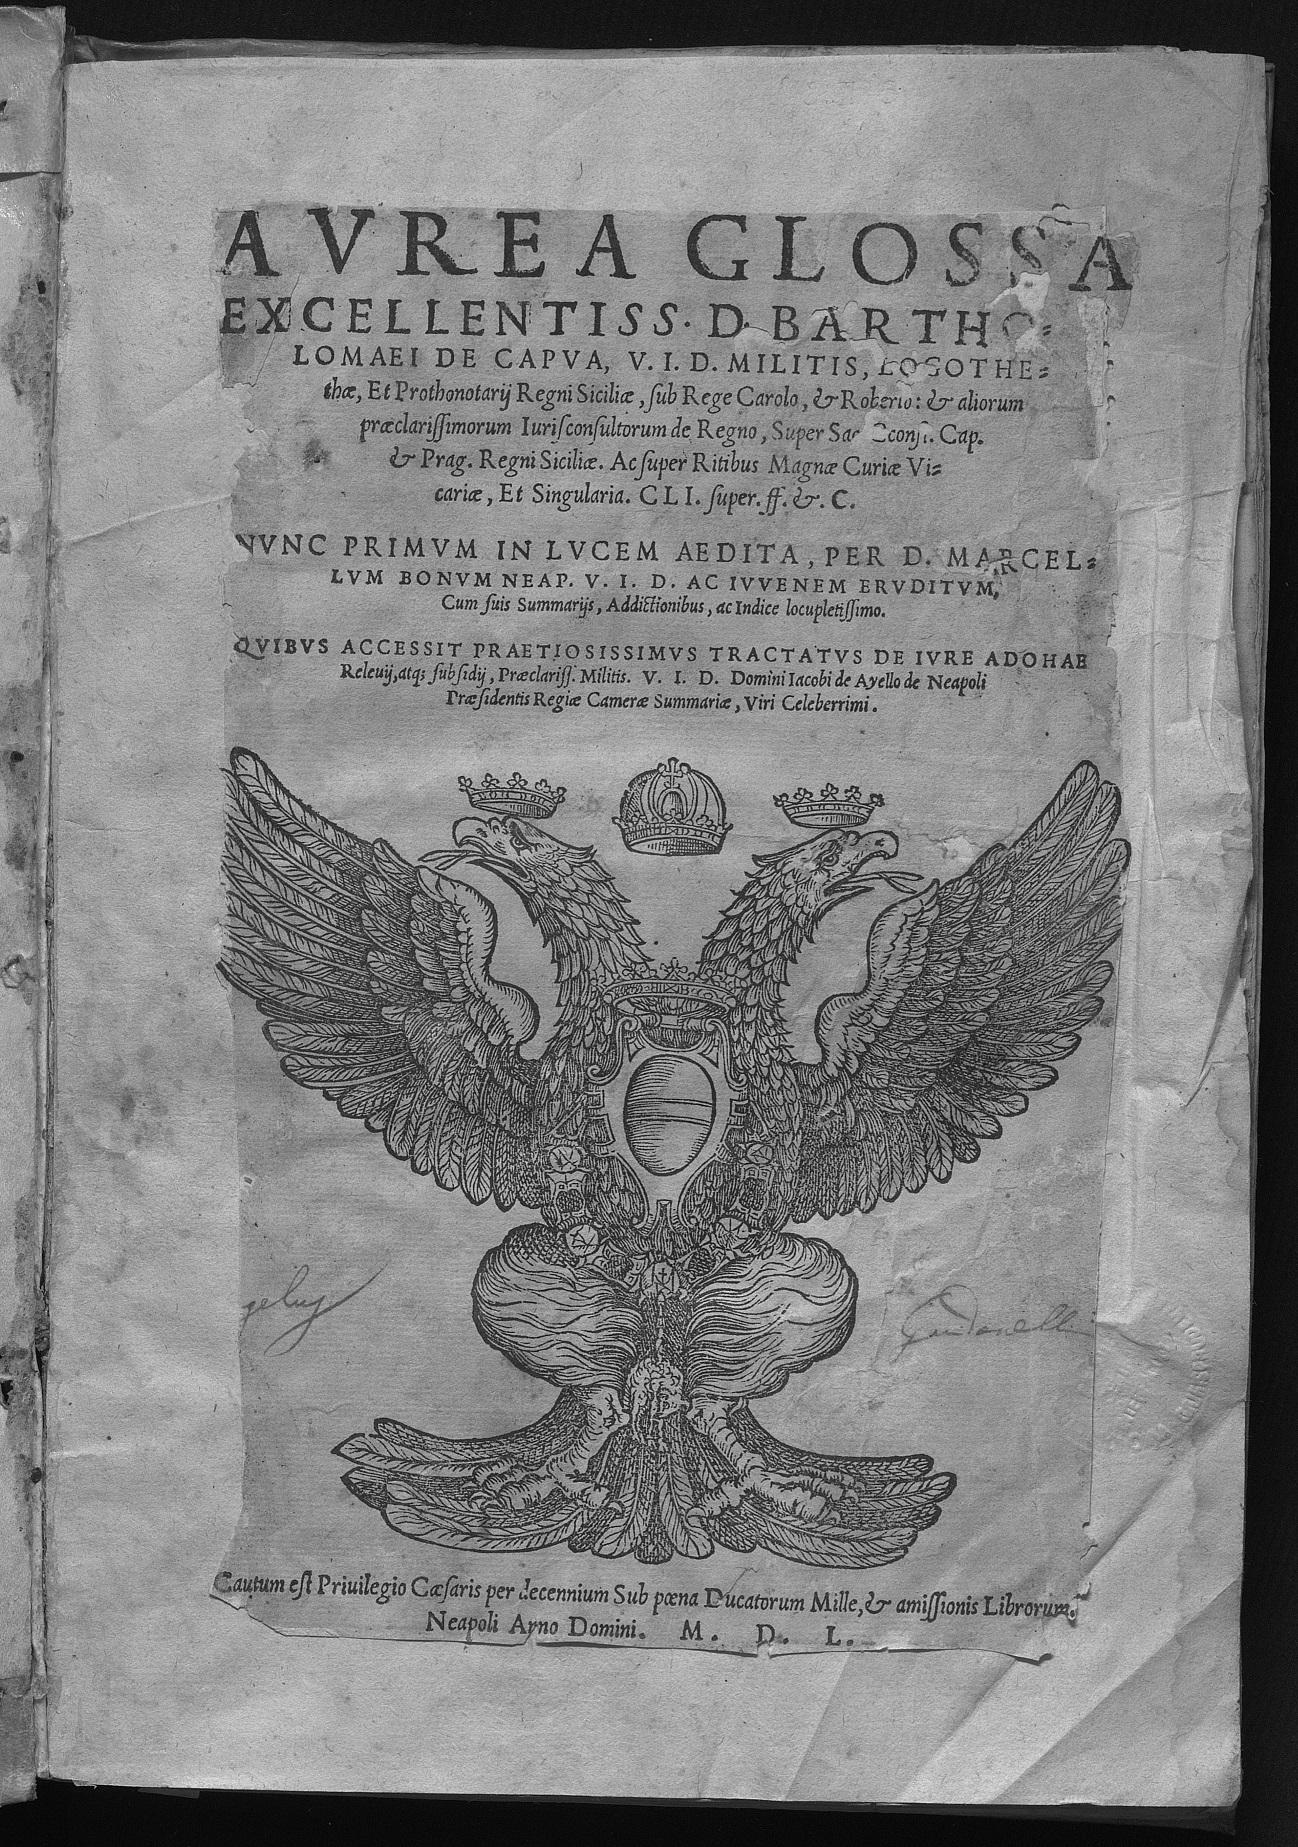 Aurea glossa excellentiss. D. Bartholomaei de Capua